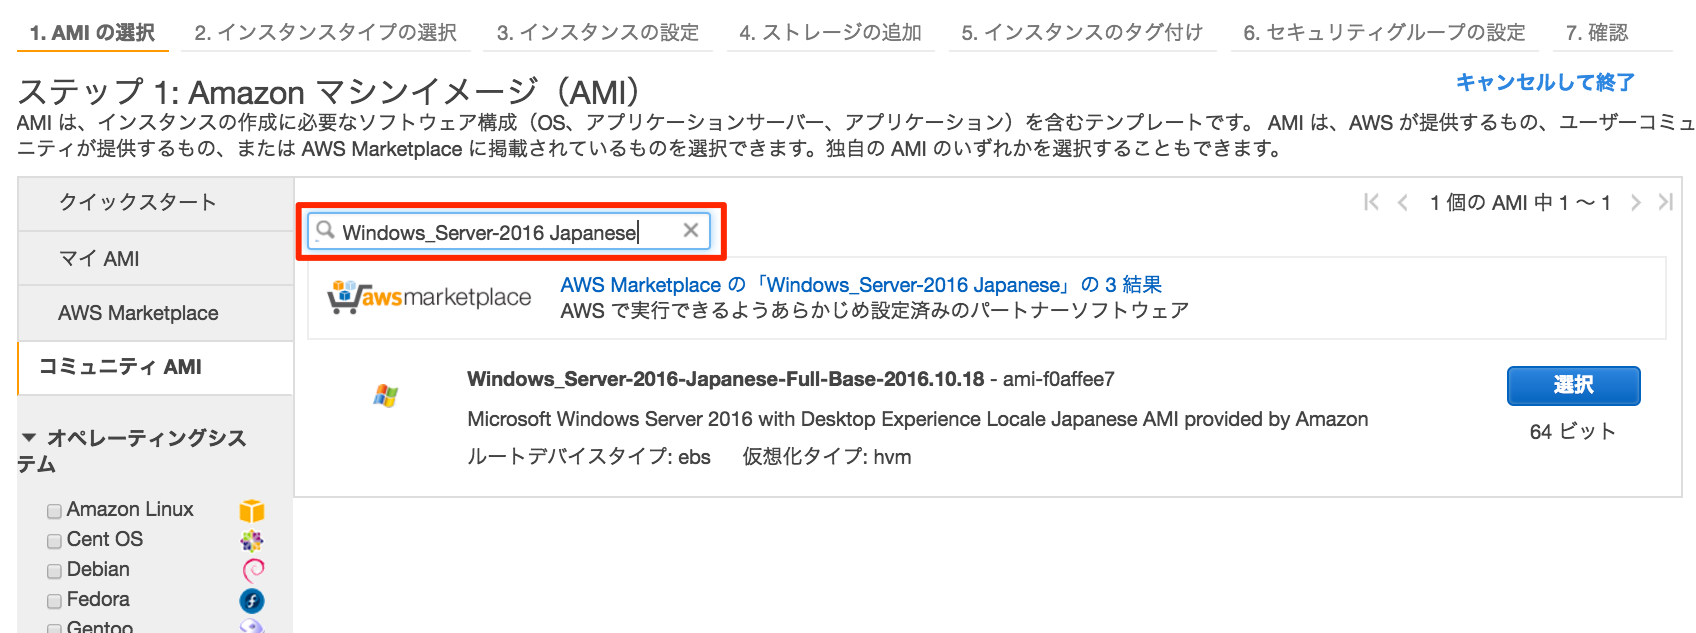 windows-server-2016-no-ddrive_001